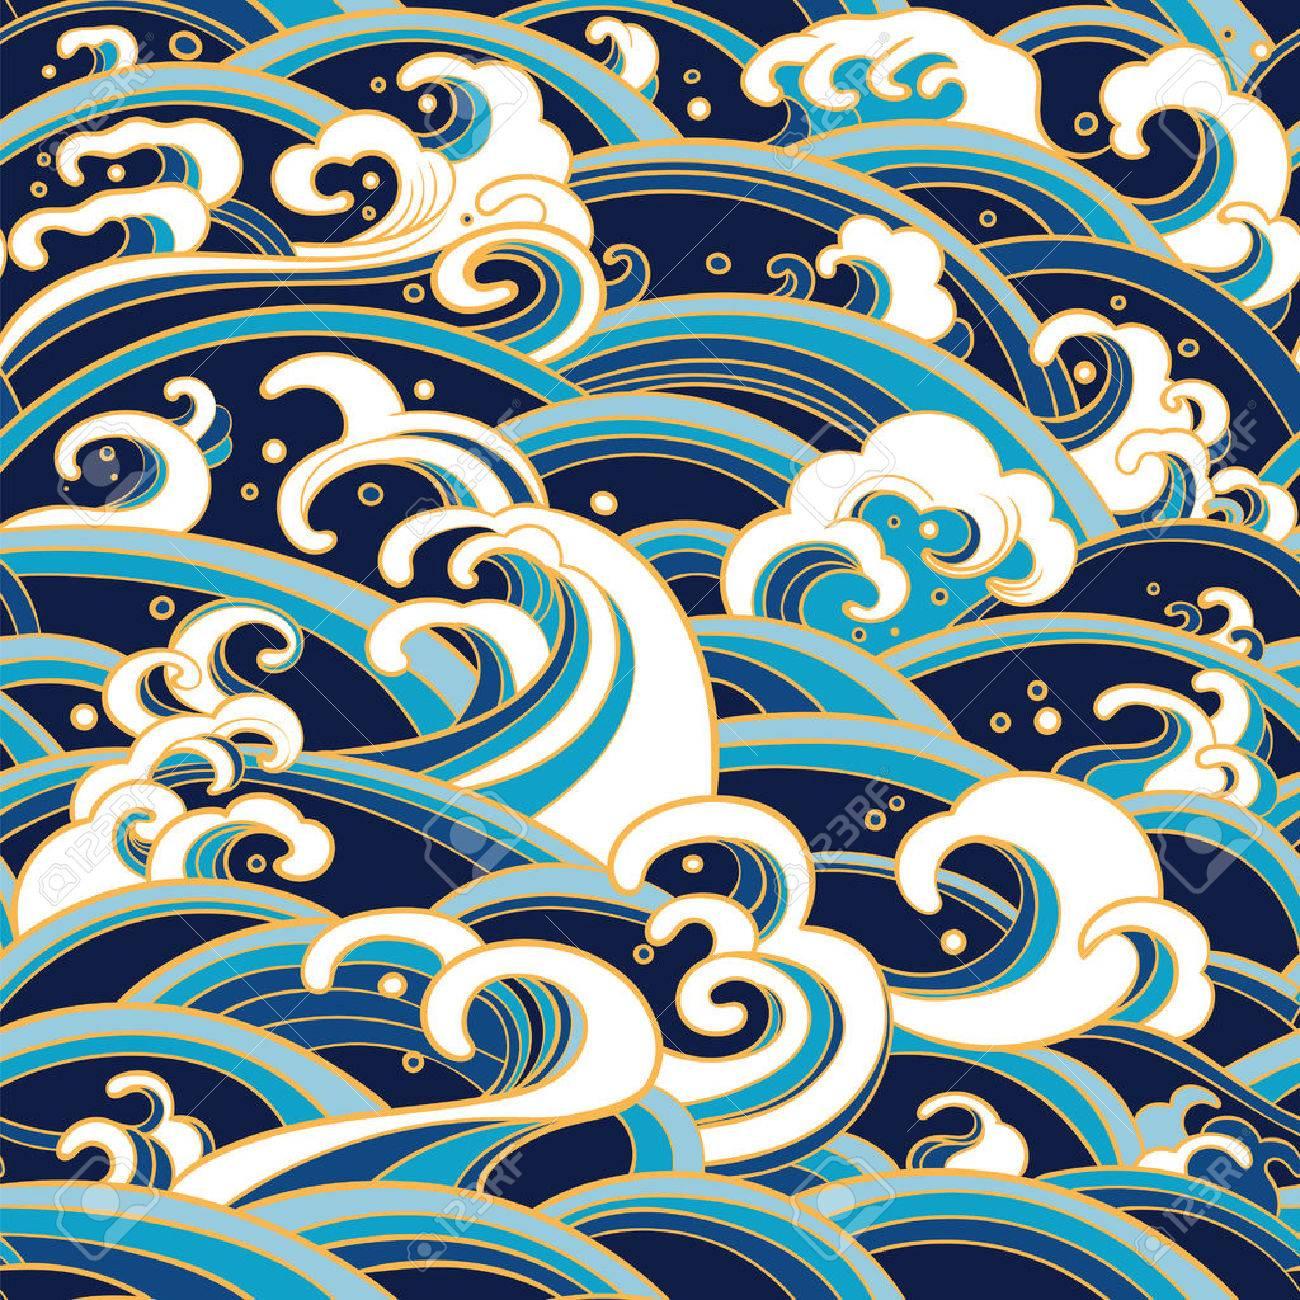 Traditional oriental seamless pattern with ocean waves, foam, splashes. - 54007875